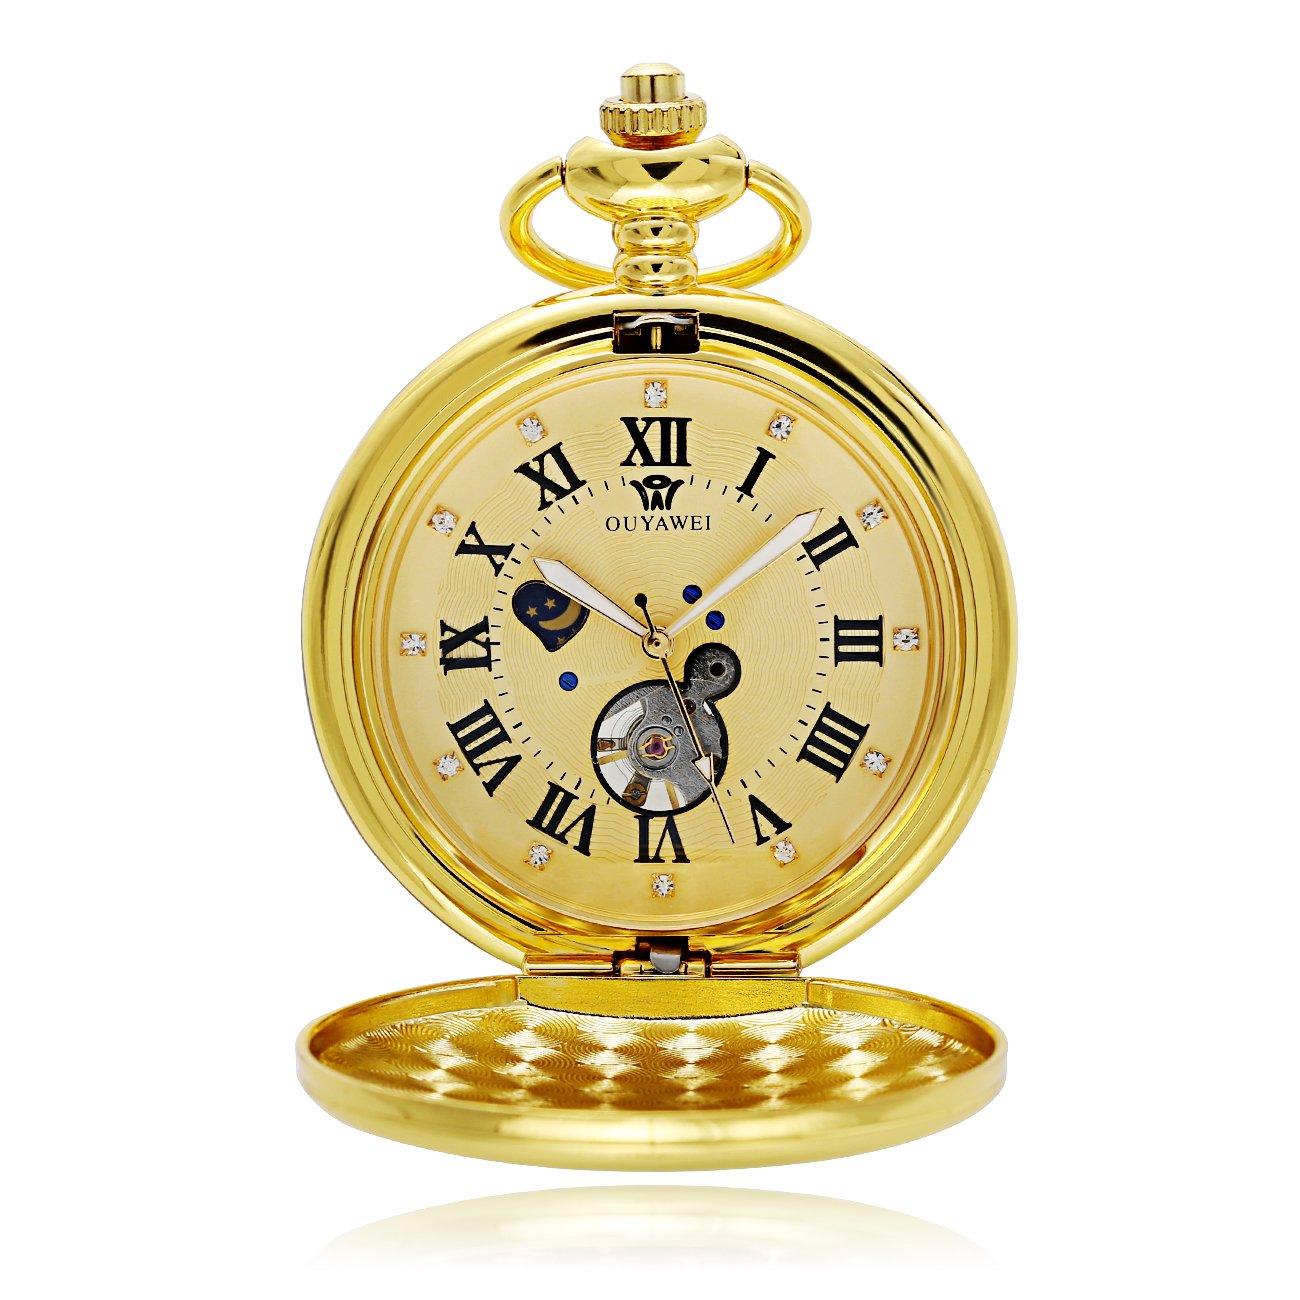 OUYAWEI Mechanical Pocket Watch Hollow Dial Moon Phase Function Gold Tone Women Fob Watch (Gold)